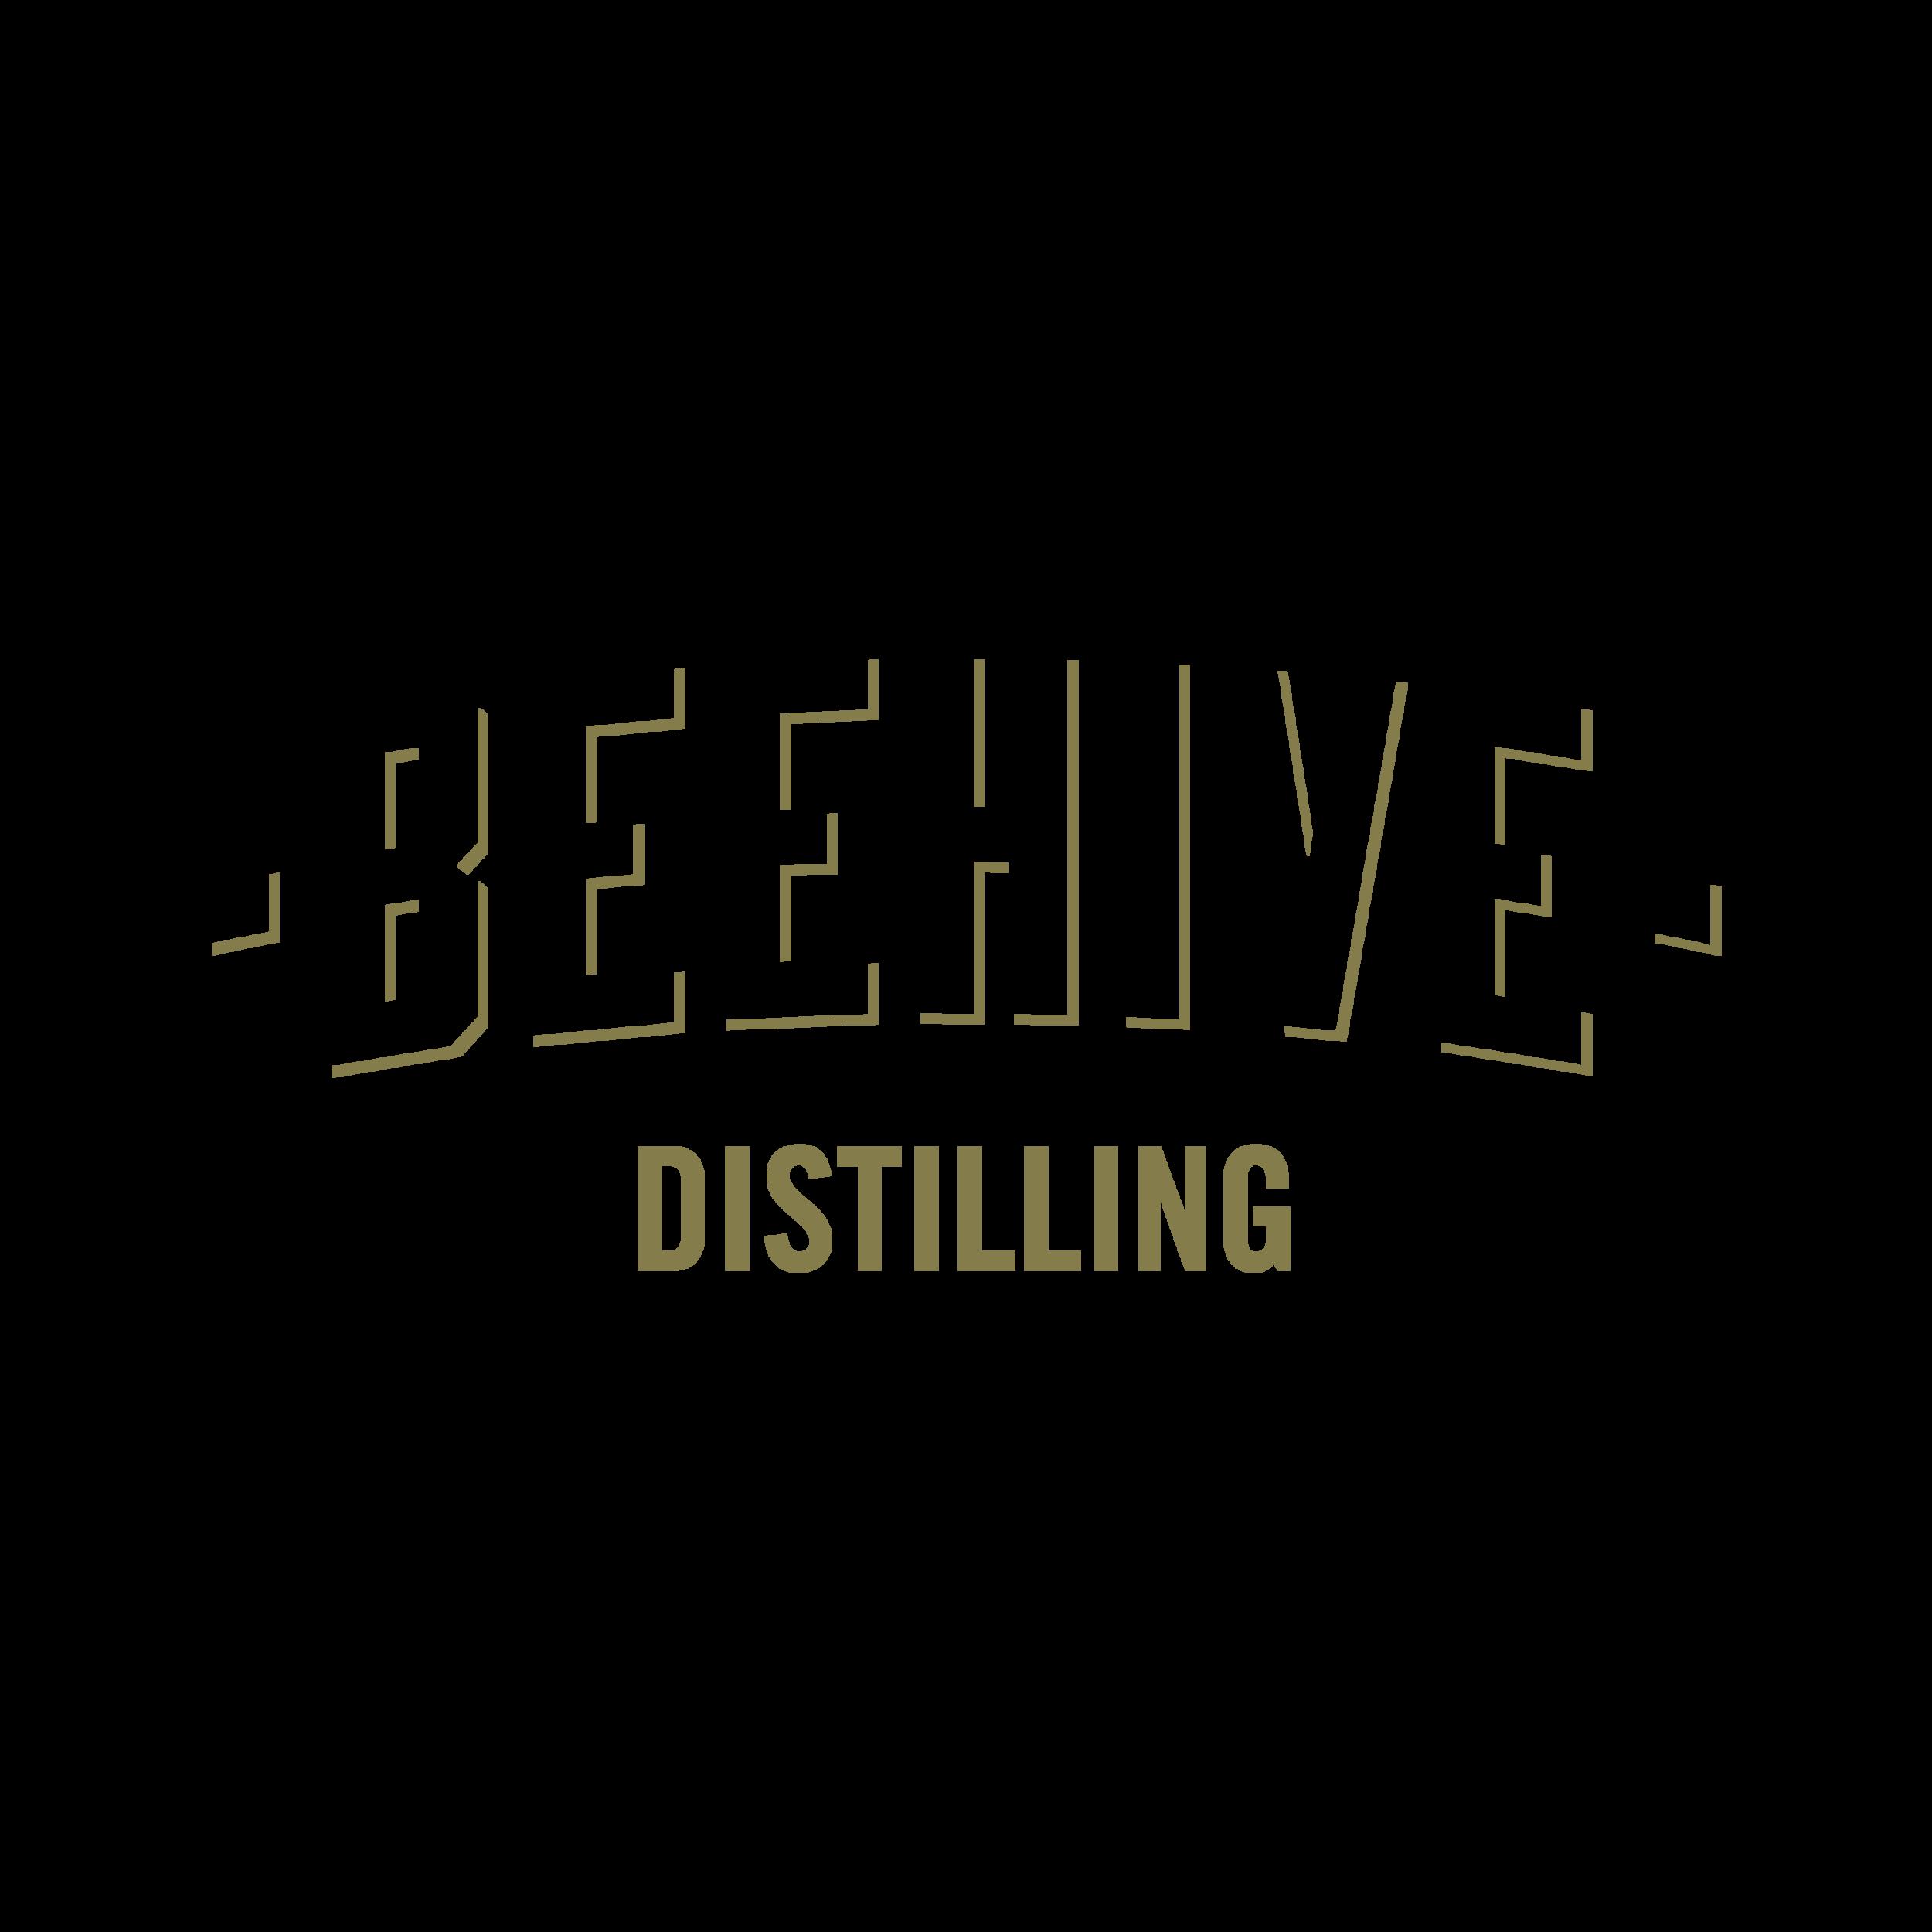 beehive-distilling-logo-01.png